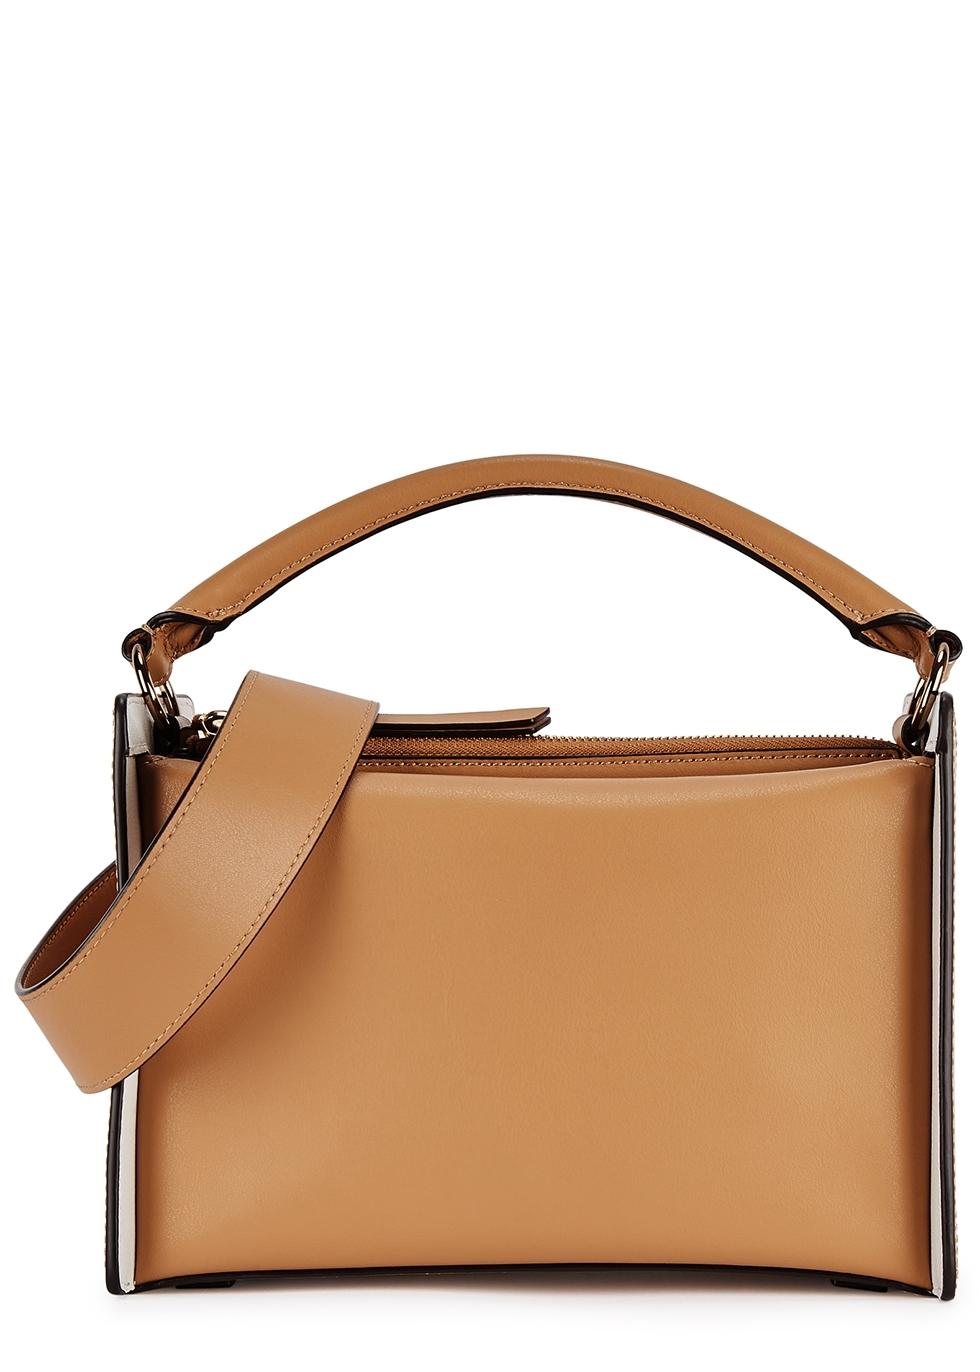 c14d1717 Women's Designer Bags, Handbags and Purses - Harvey Nichols